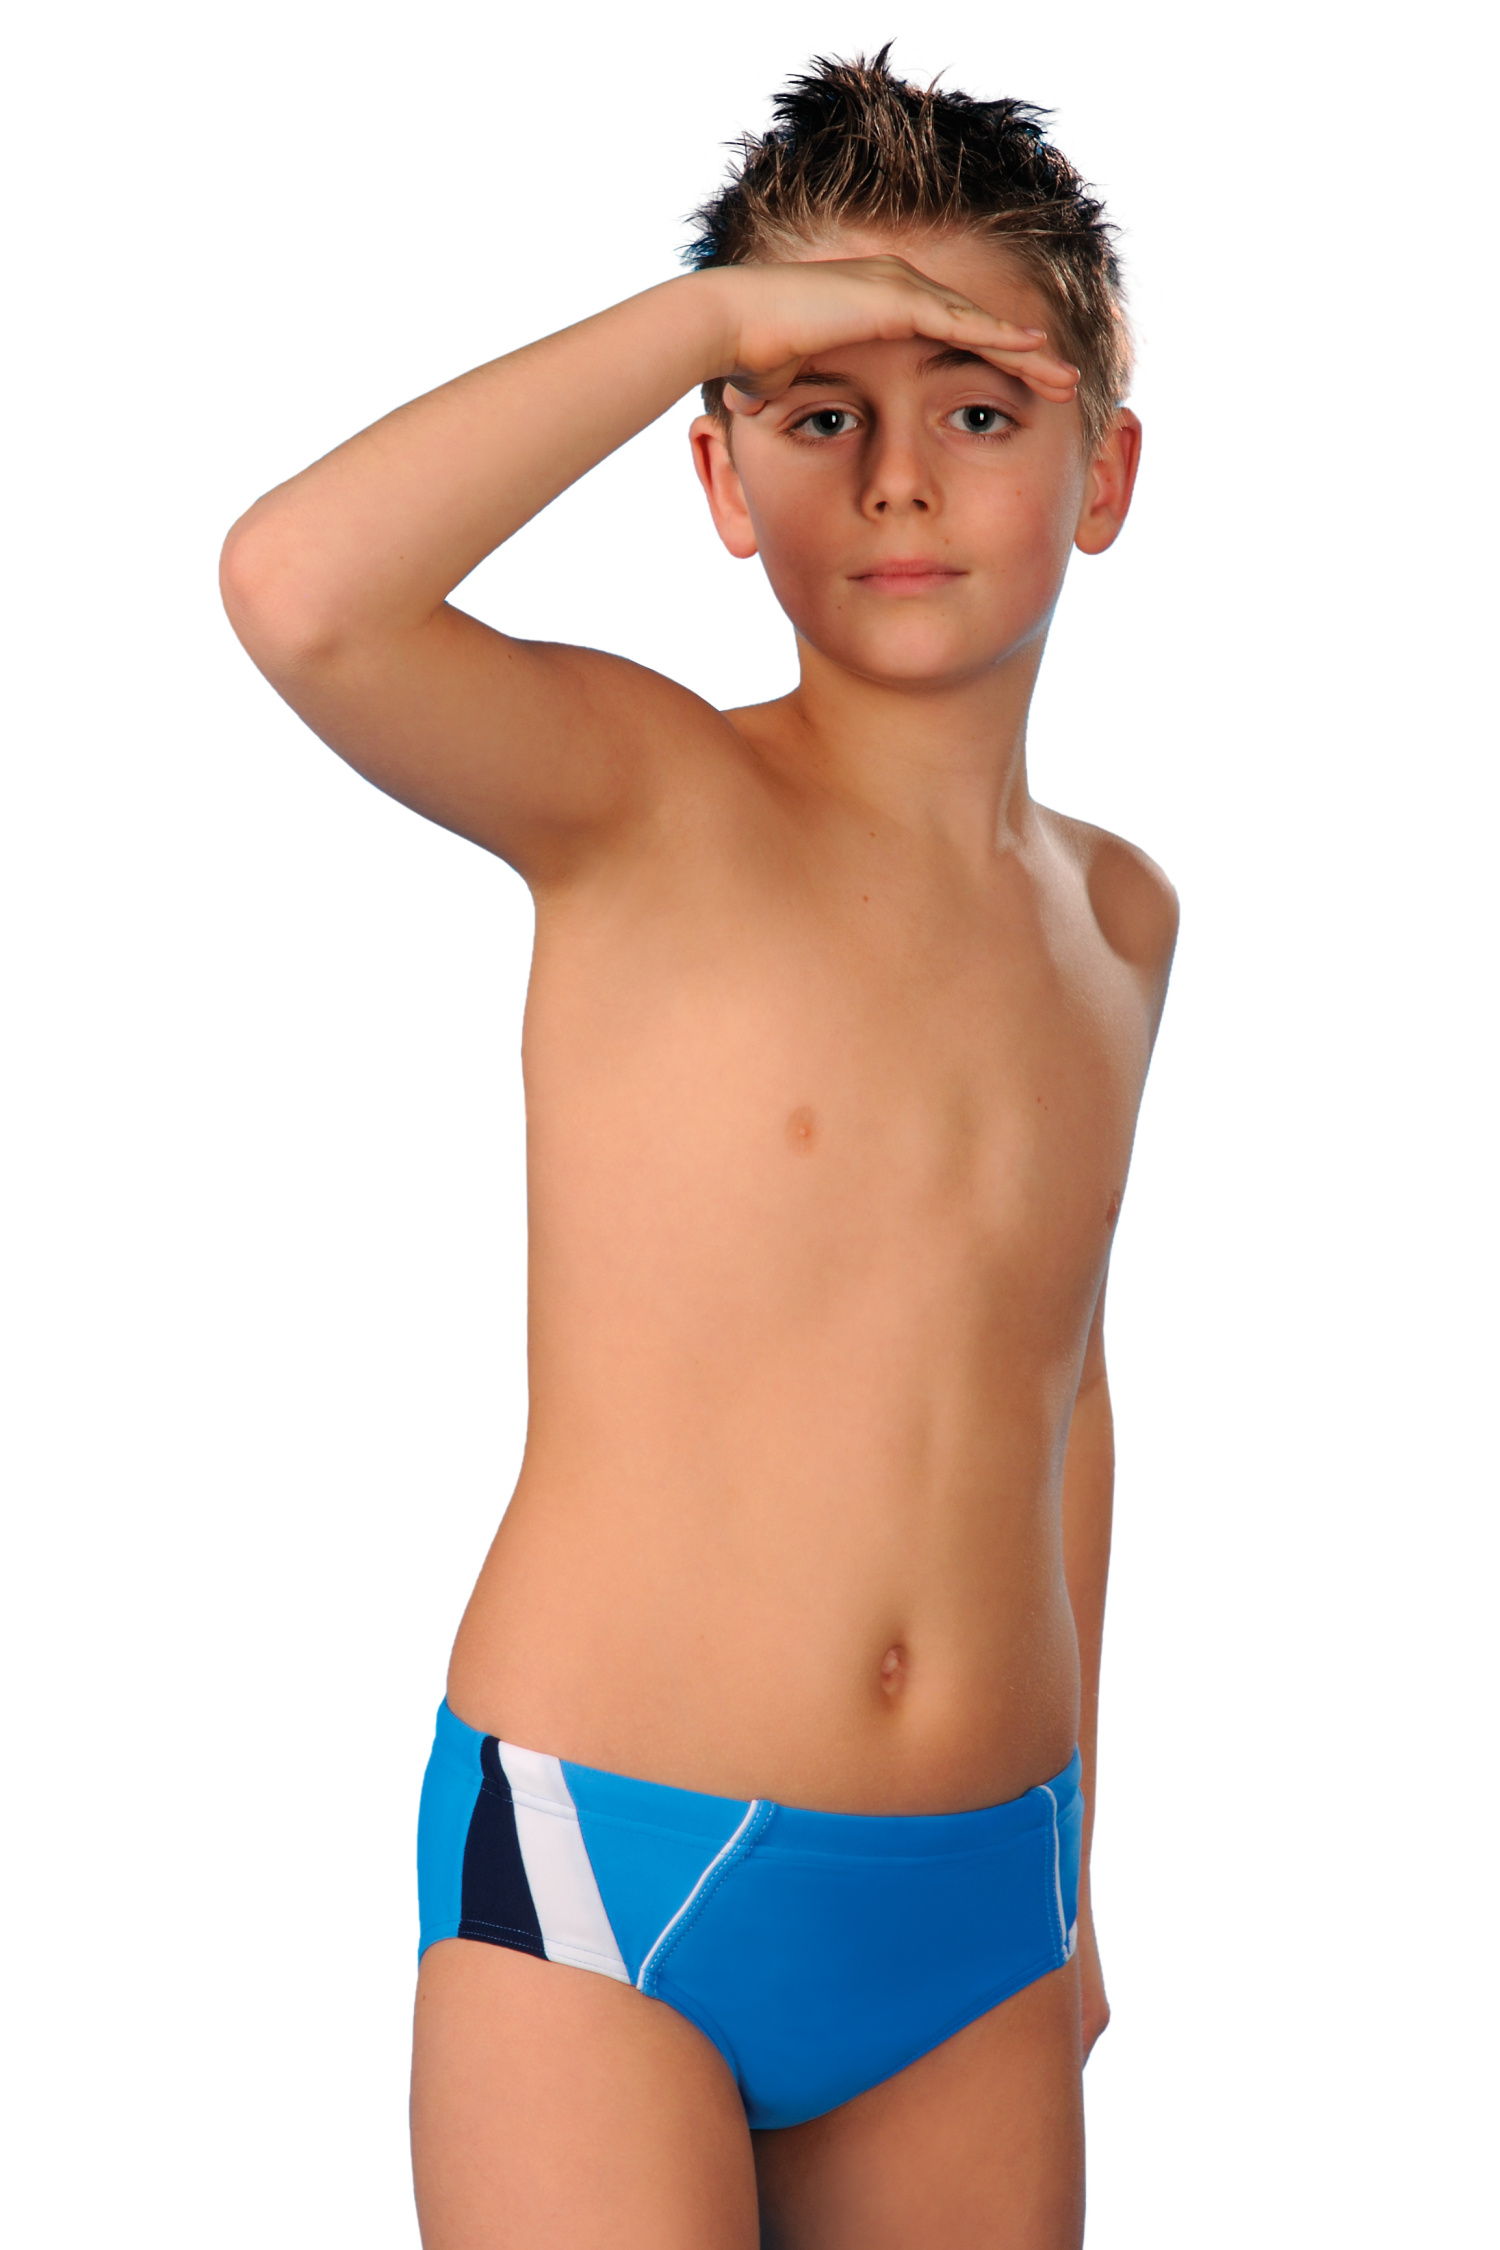 Plavky chlapecké Kaja I modré - modrá